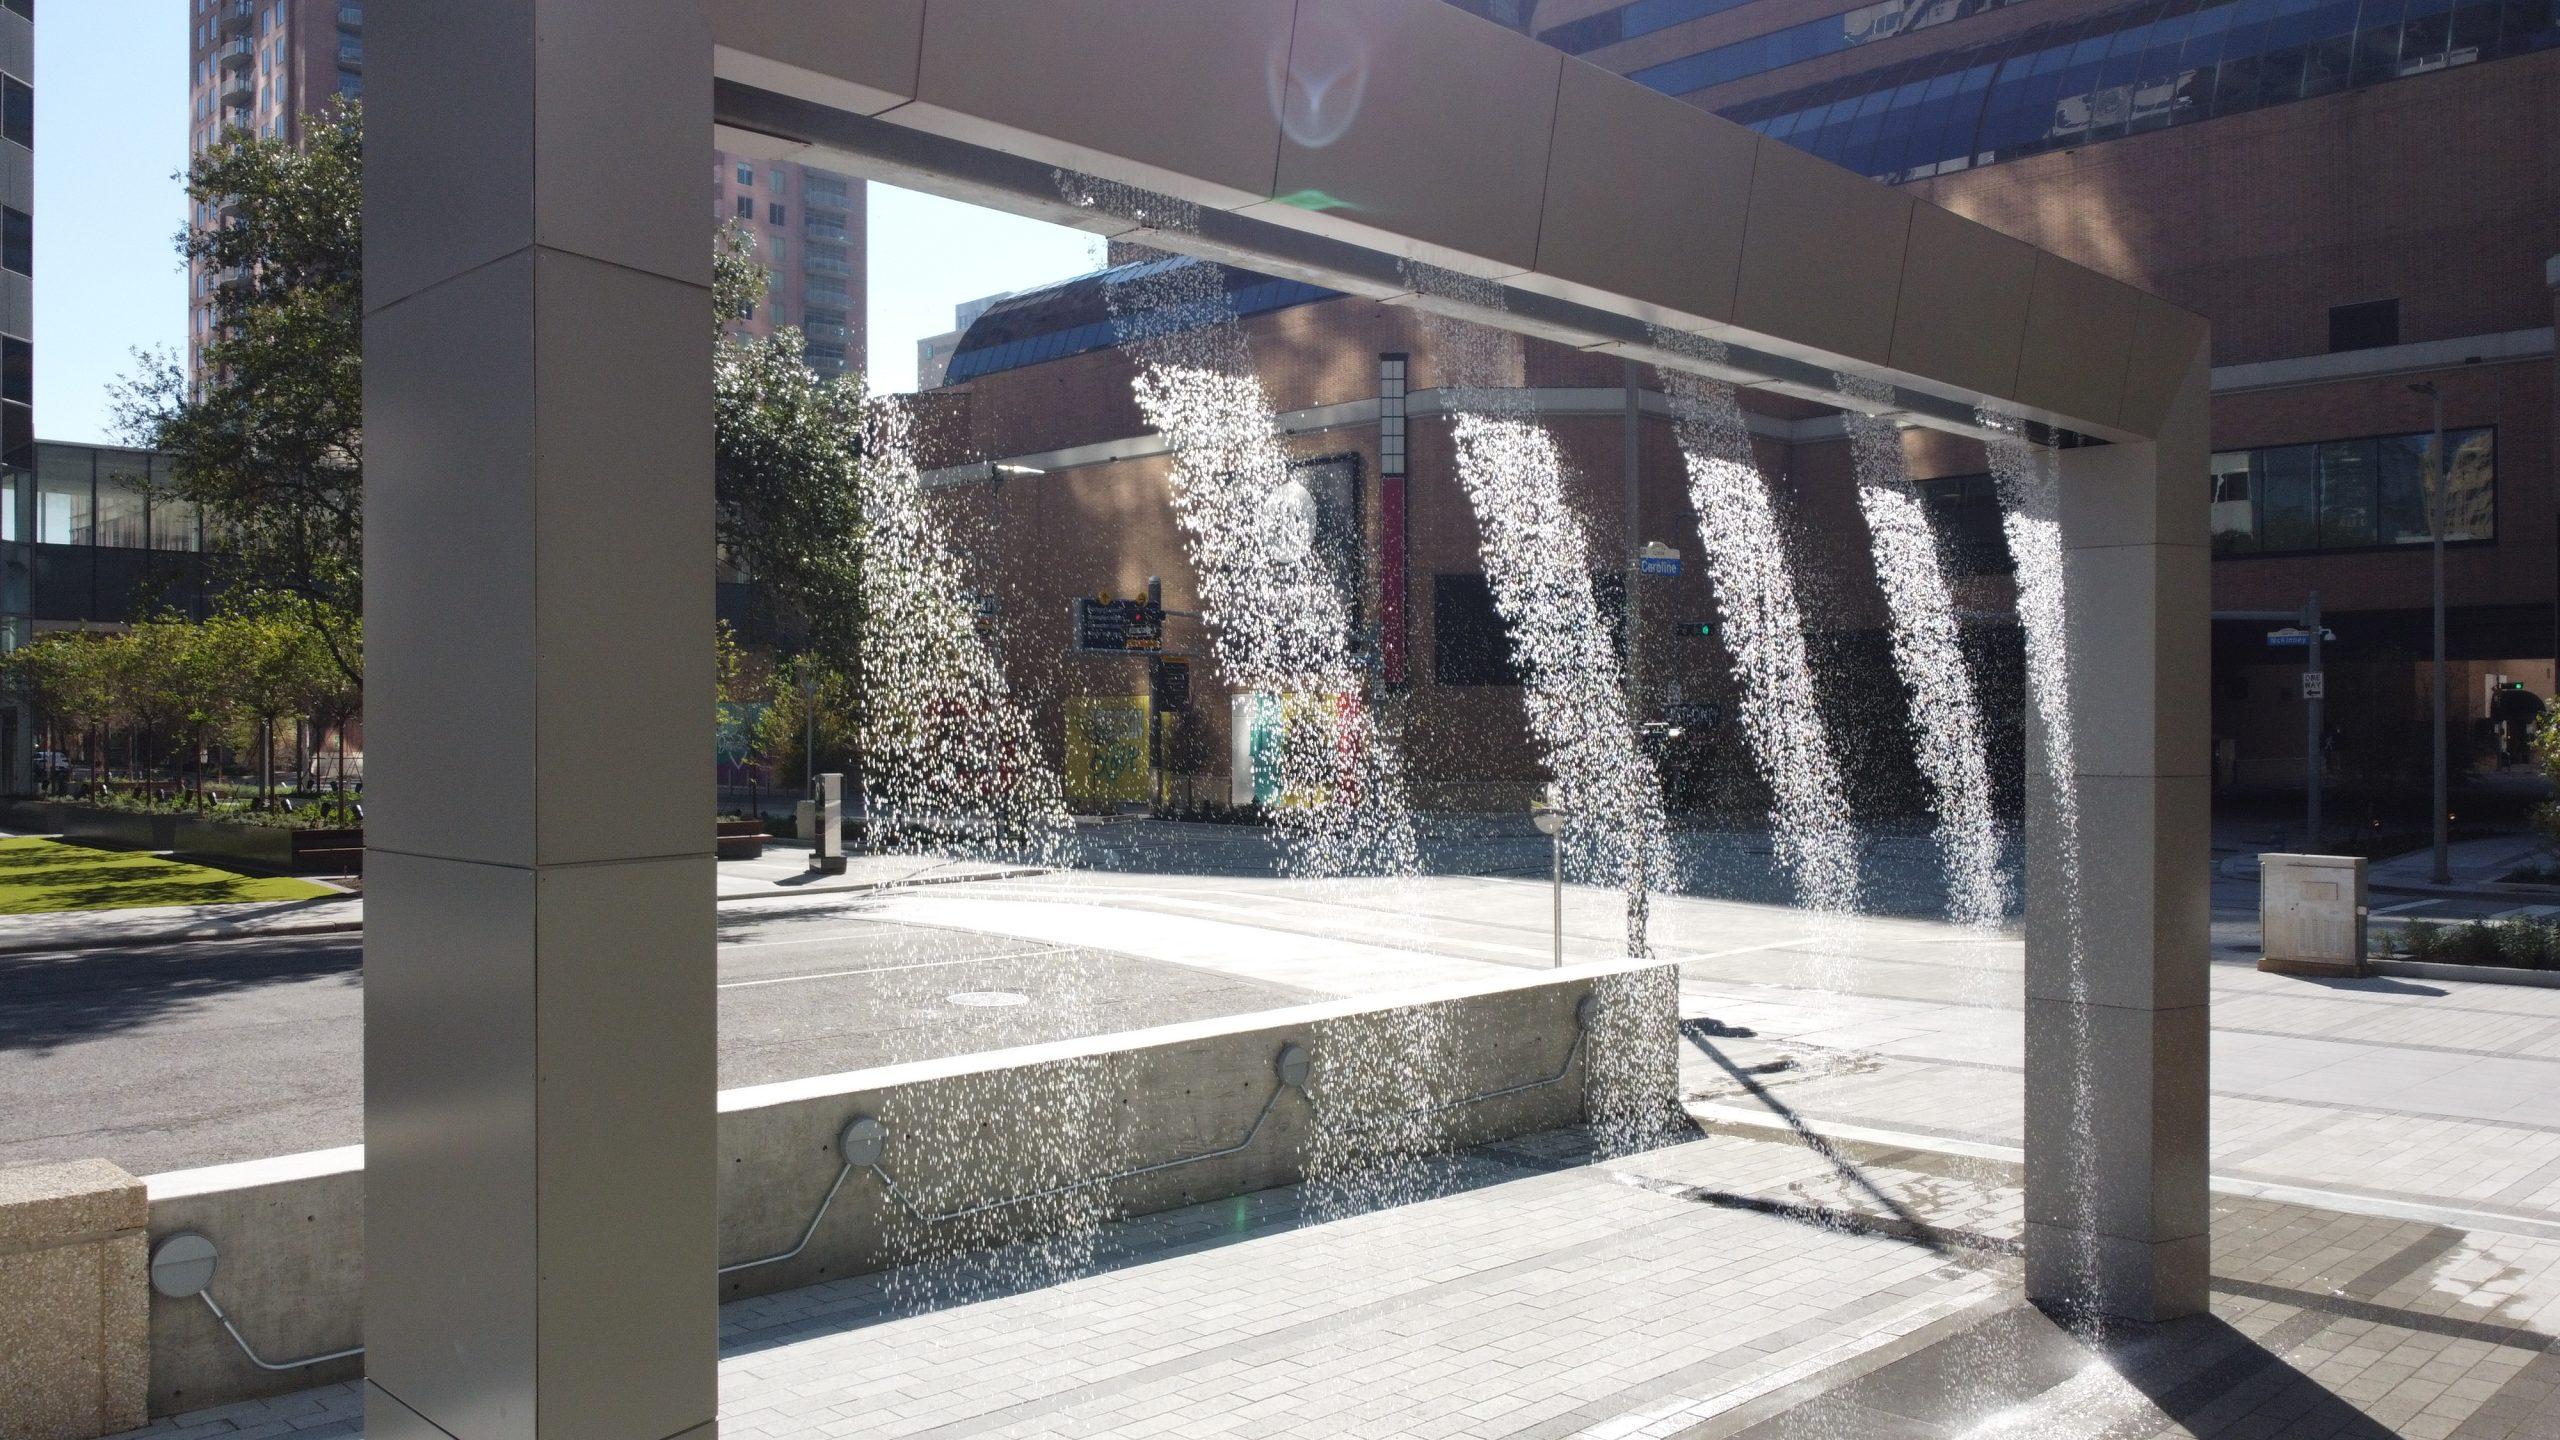 Digital Water Curtain at Houston Center